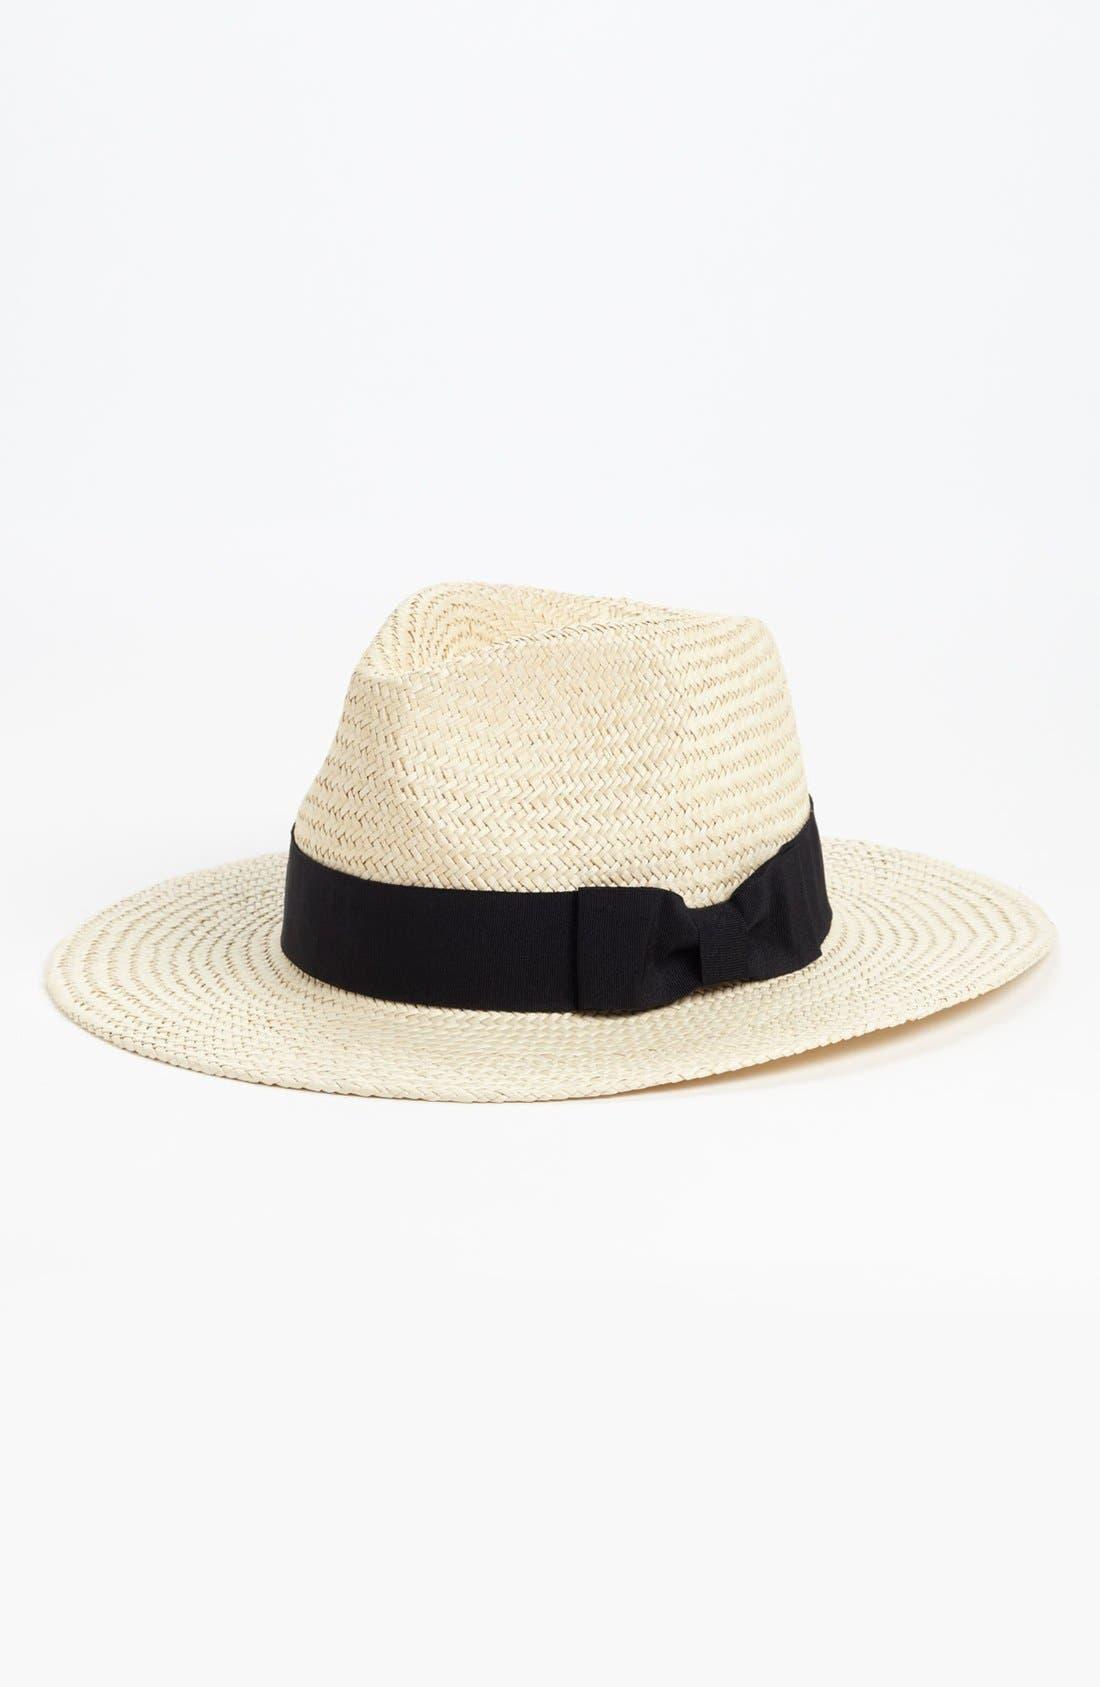 Alternate Image 1 Selected - Trouvé Straw Panama Hat